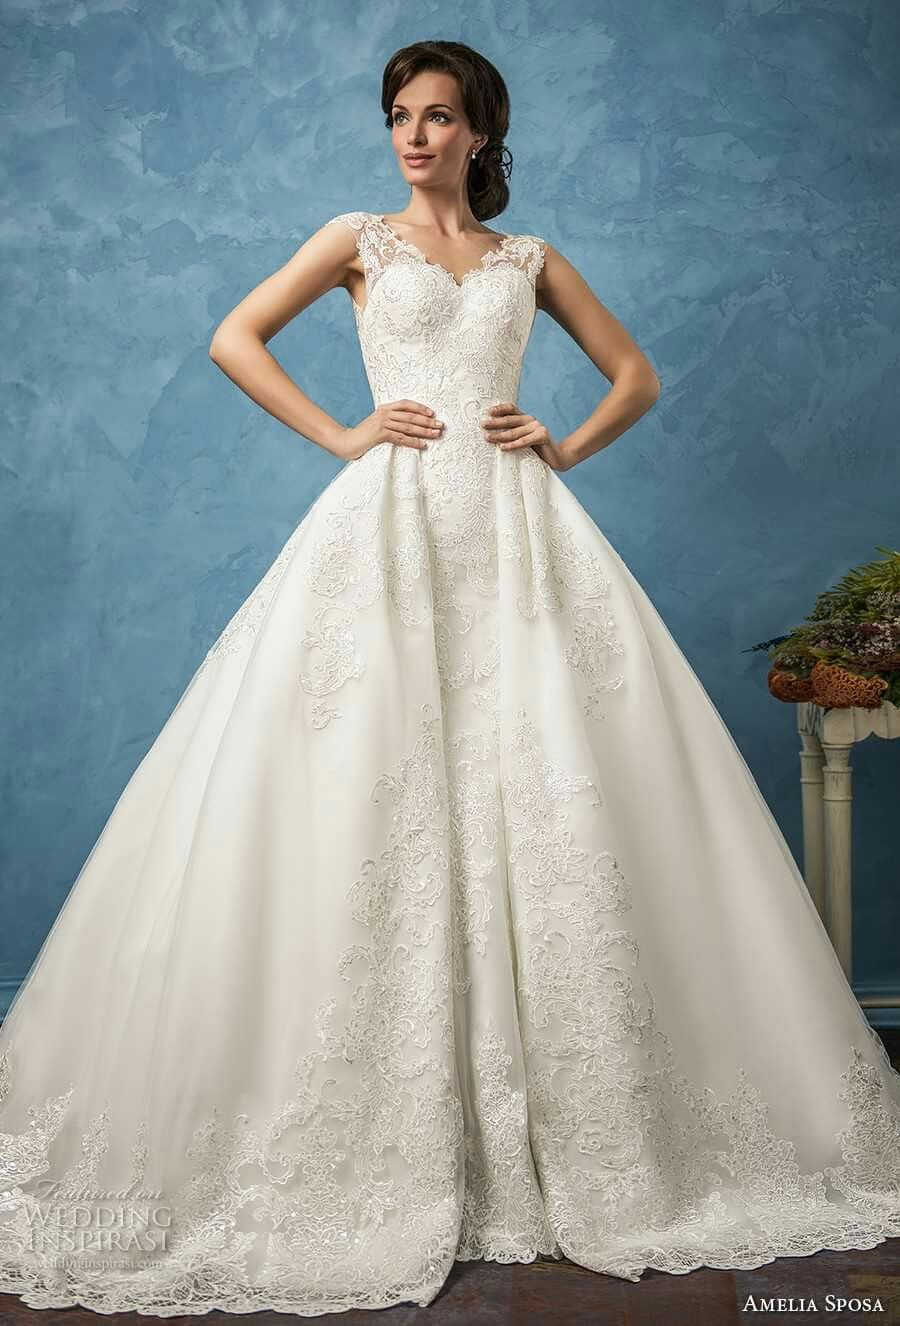 Fantastic Vestidos De Novia Baratos Sevilla Pattern - All Wedding ...